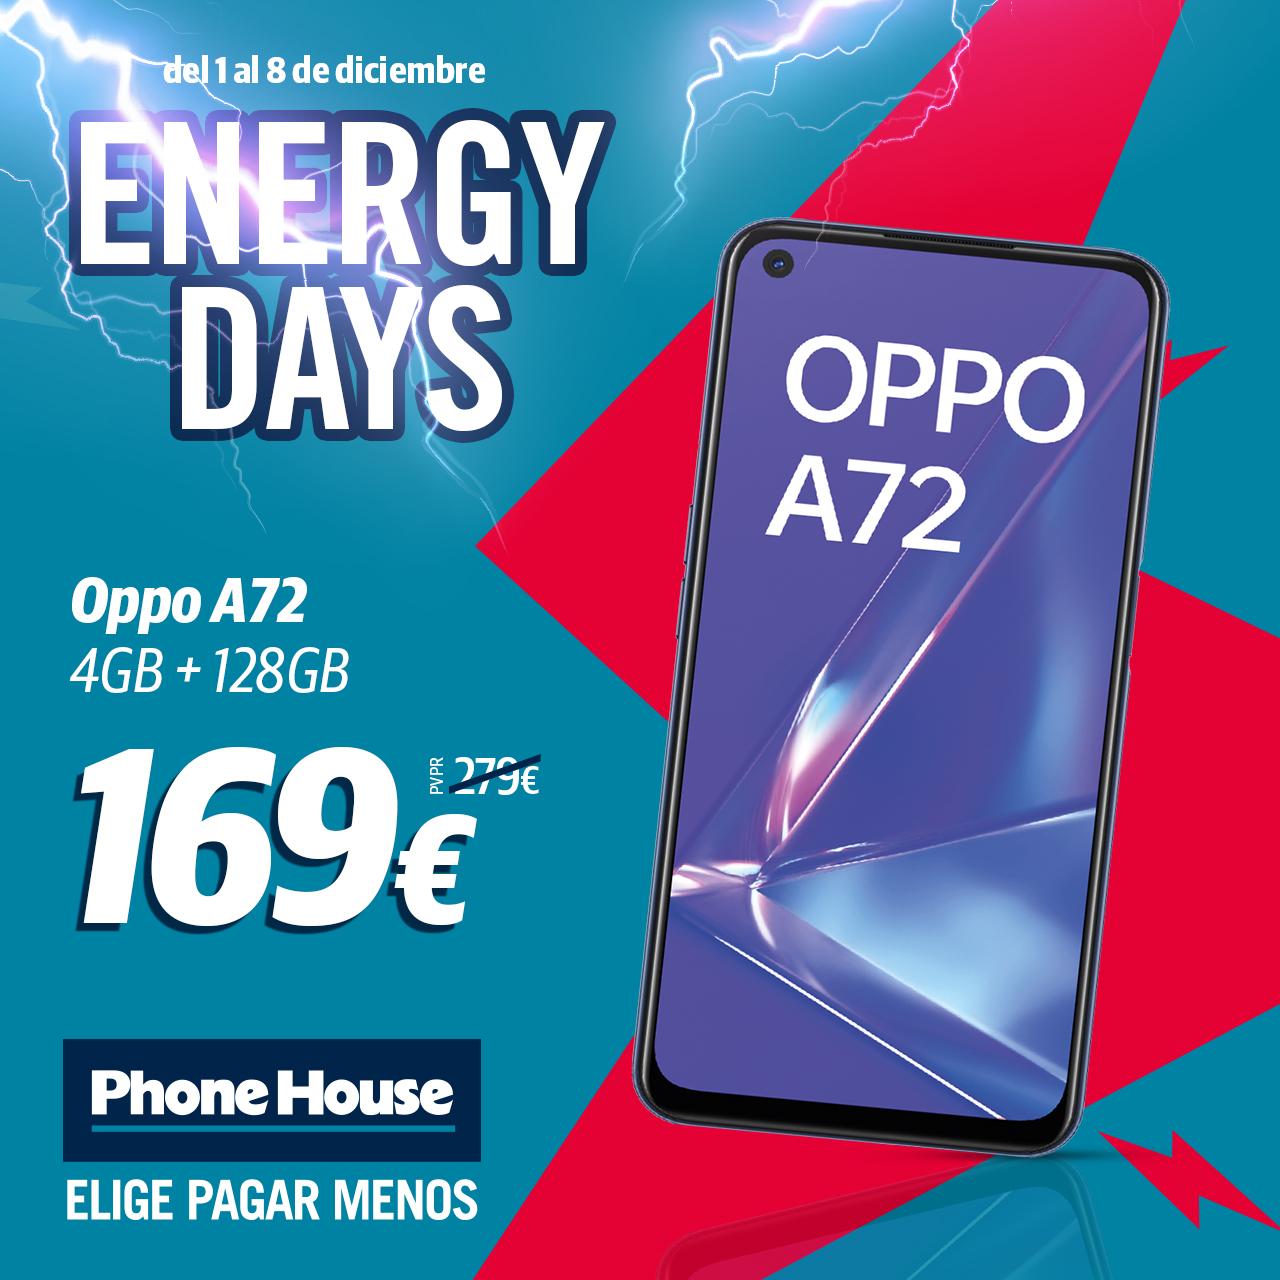 Rrss 1000x1000 Energy Days Destacado Prioridad 1